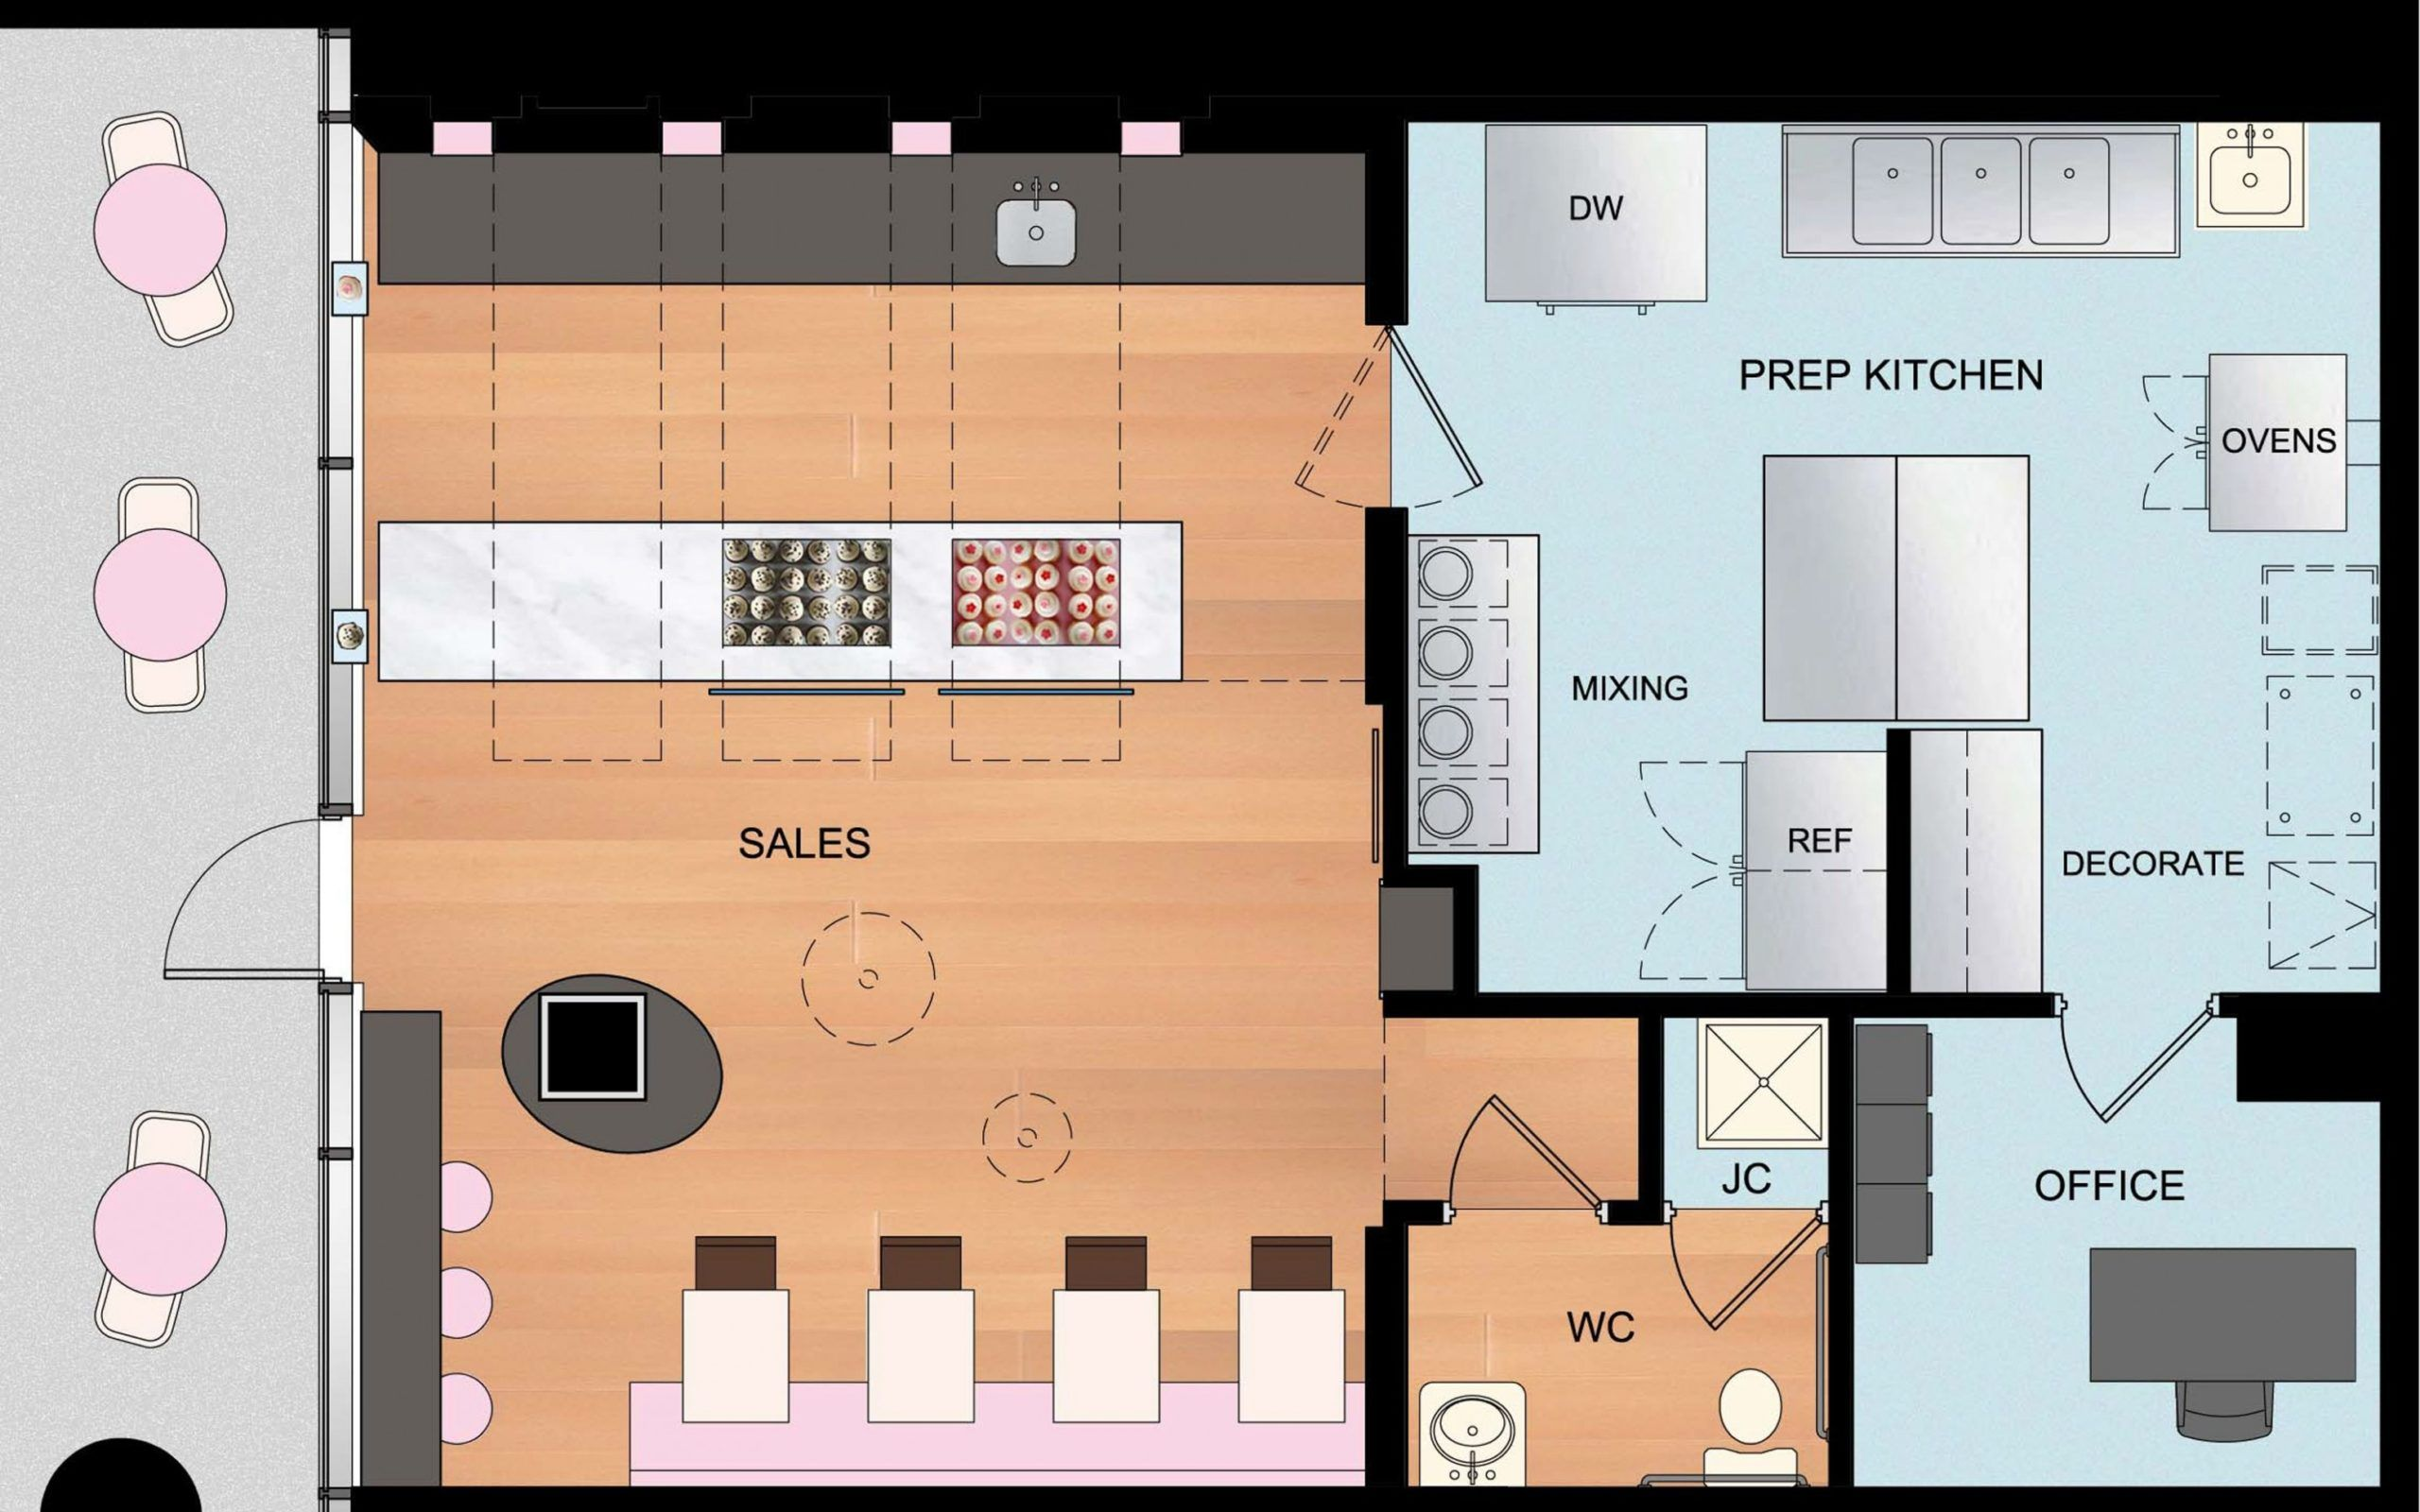 9 Benefits Of Bakery Kitchen Floor Plan Design That May Change ...